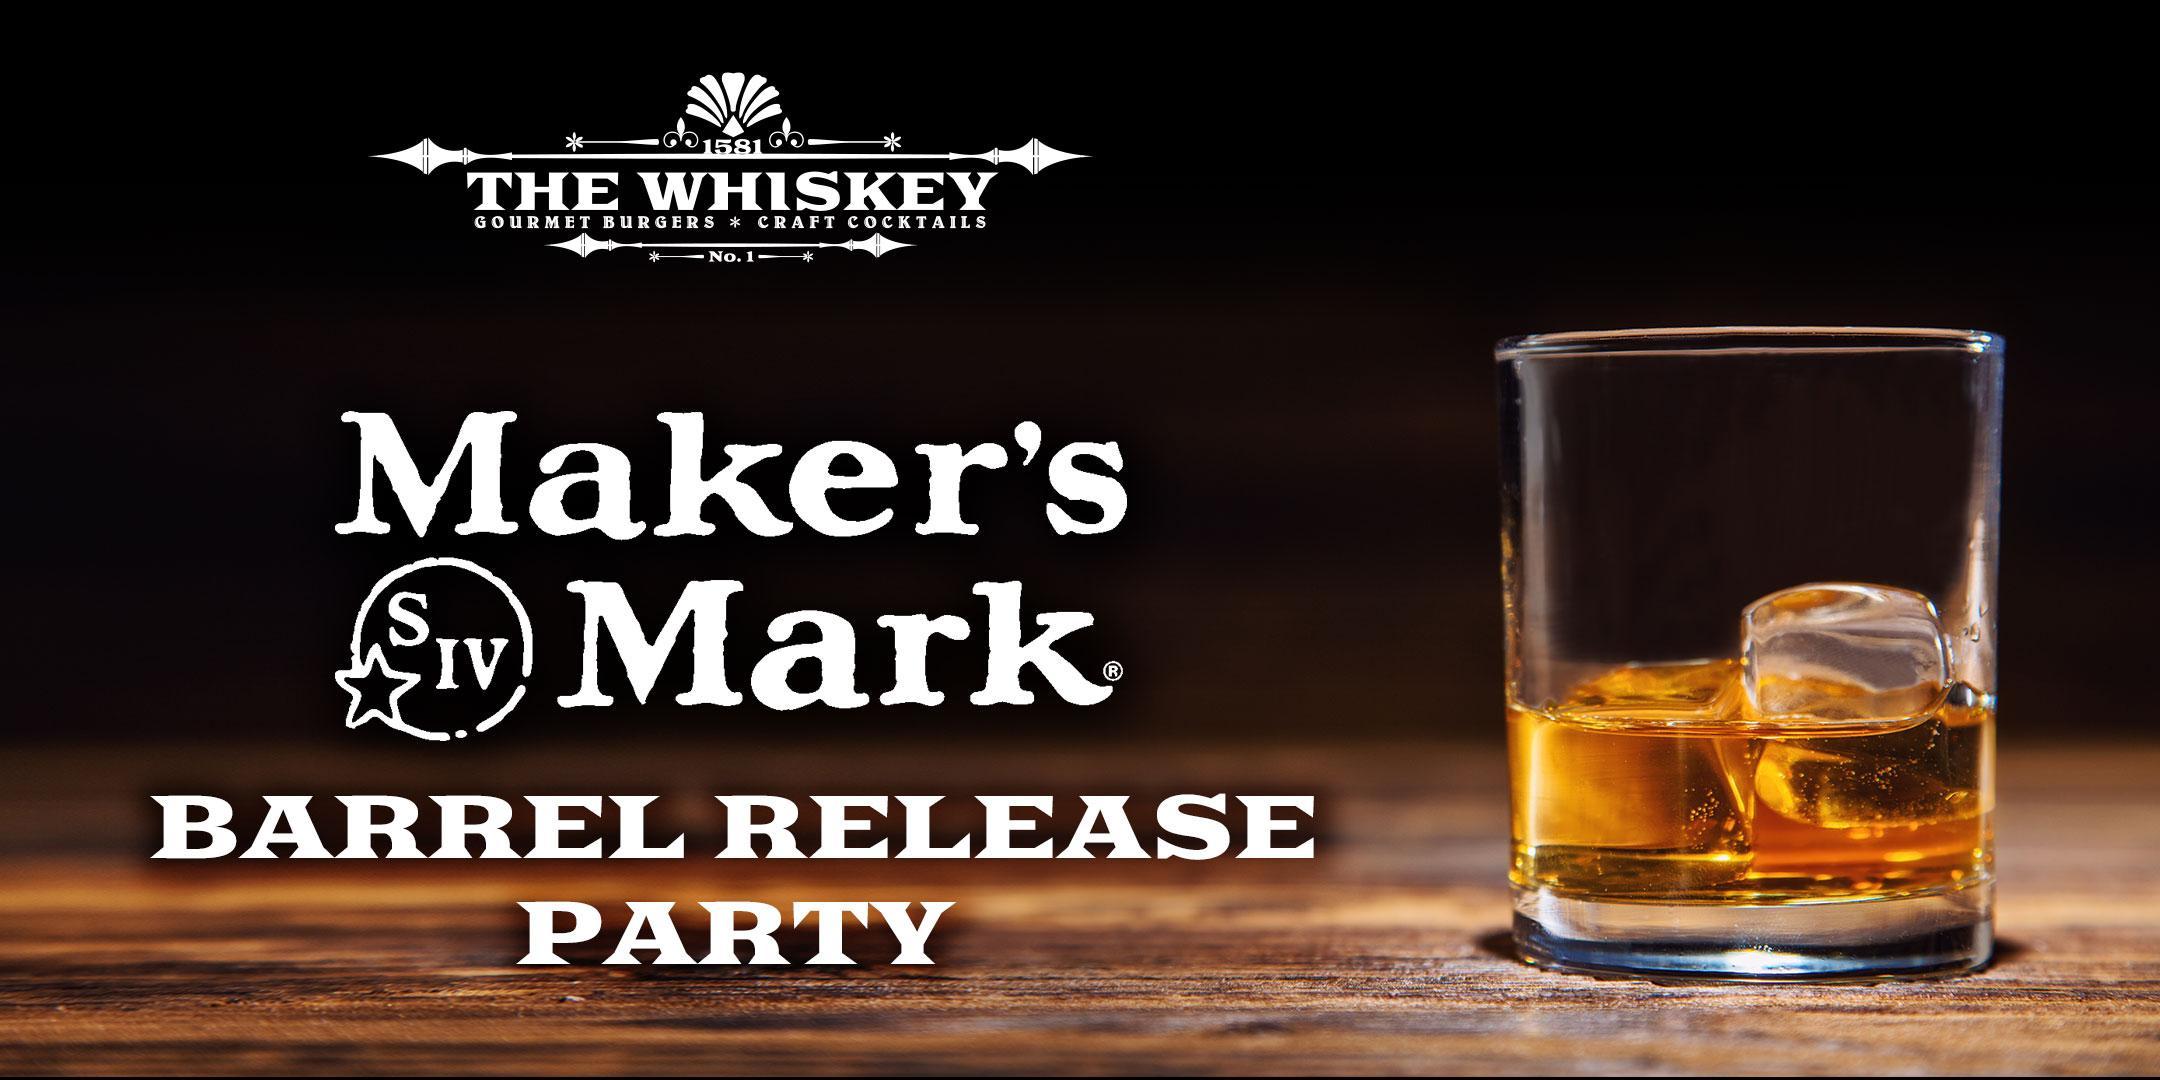 Maker's Mark Barrel Release Party